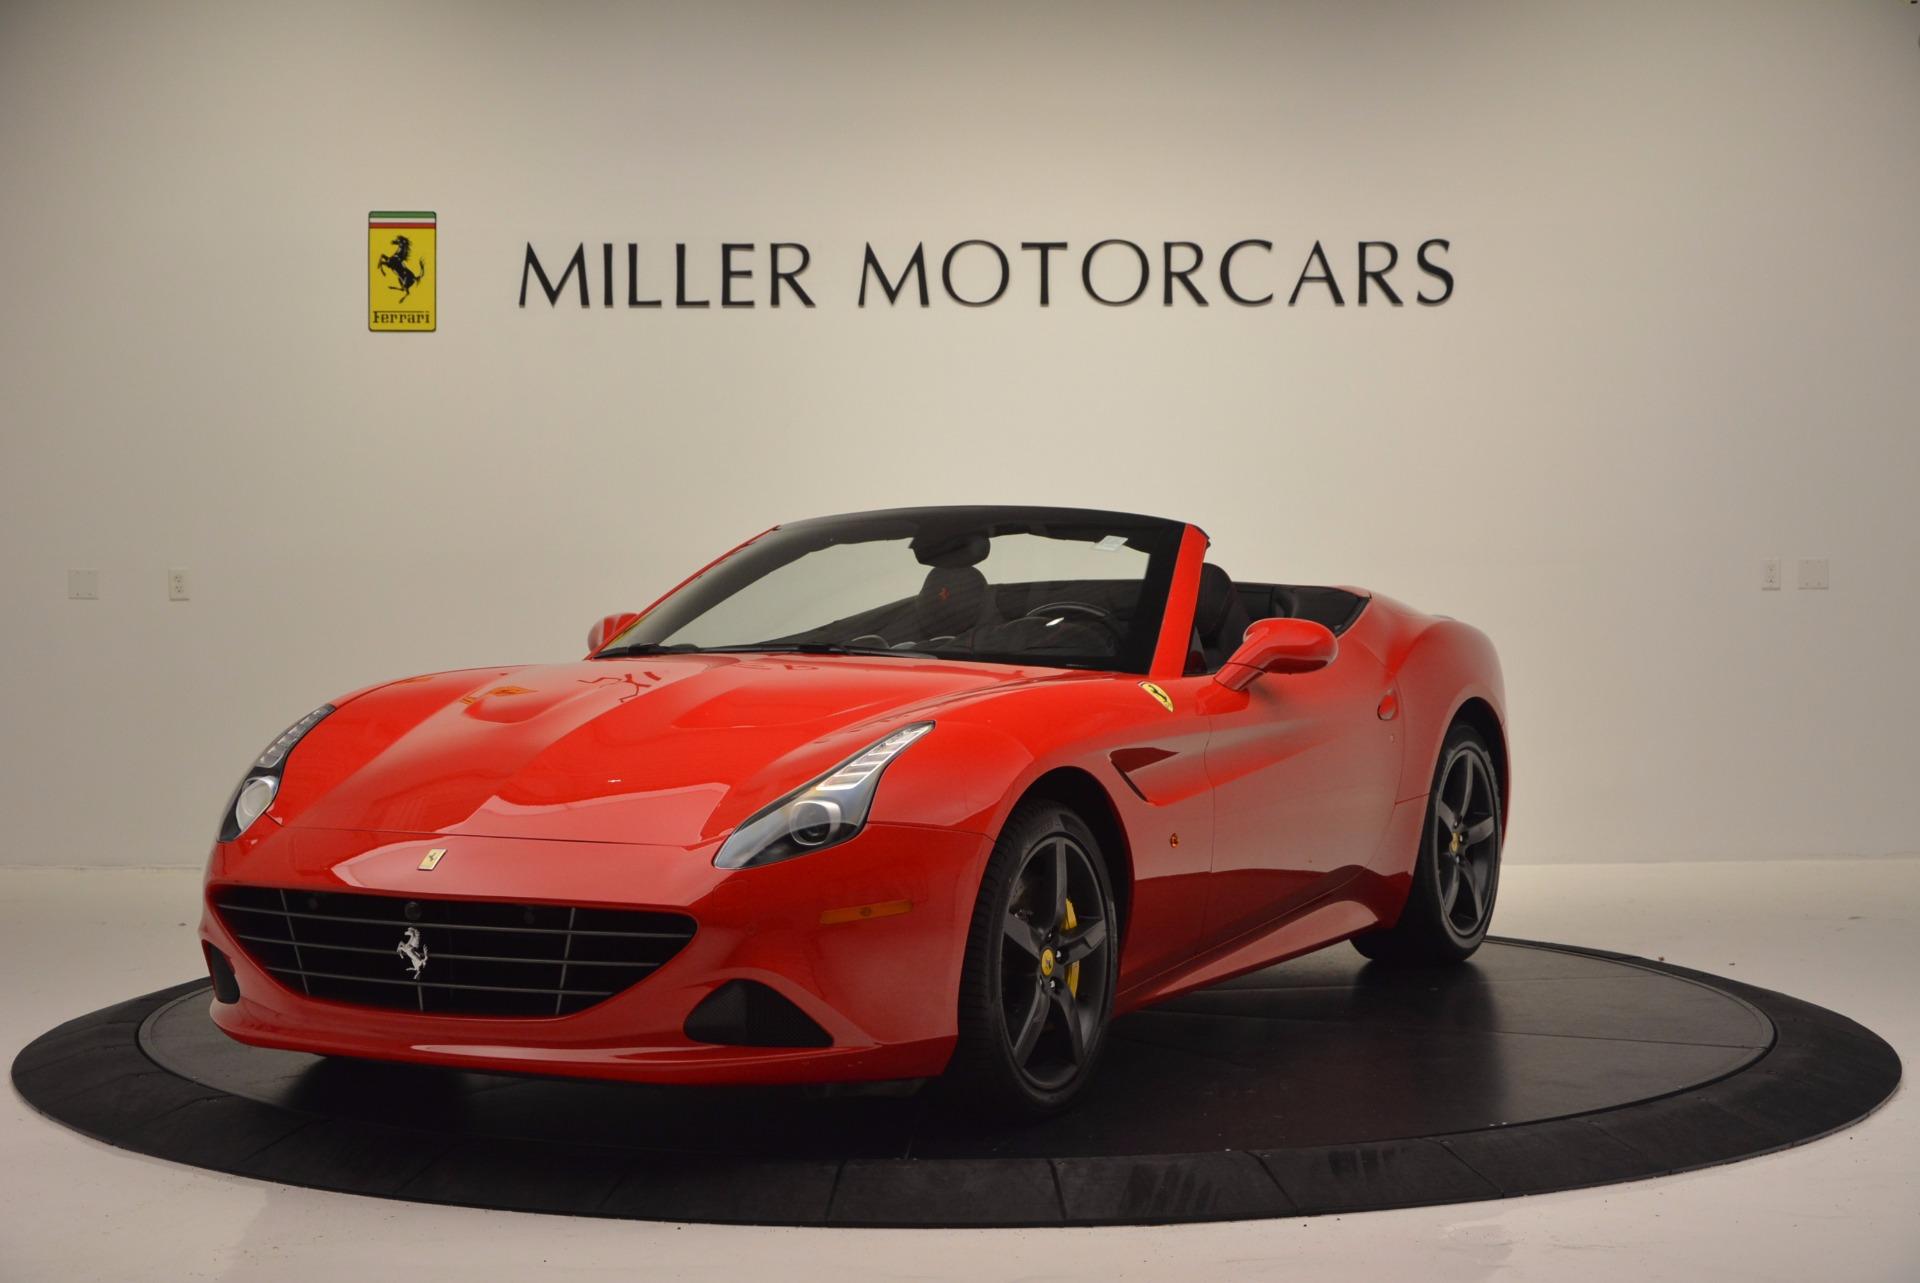 Used 2016 Ferrari California T for sale $149,900 at Aston Martin of Greenwich in Greenwich CT 06830 1